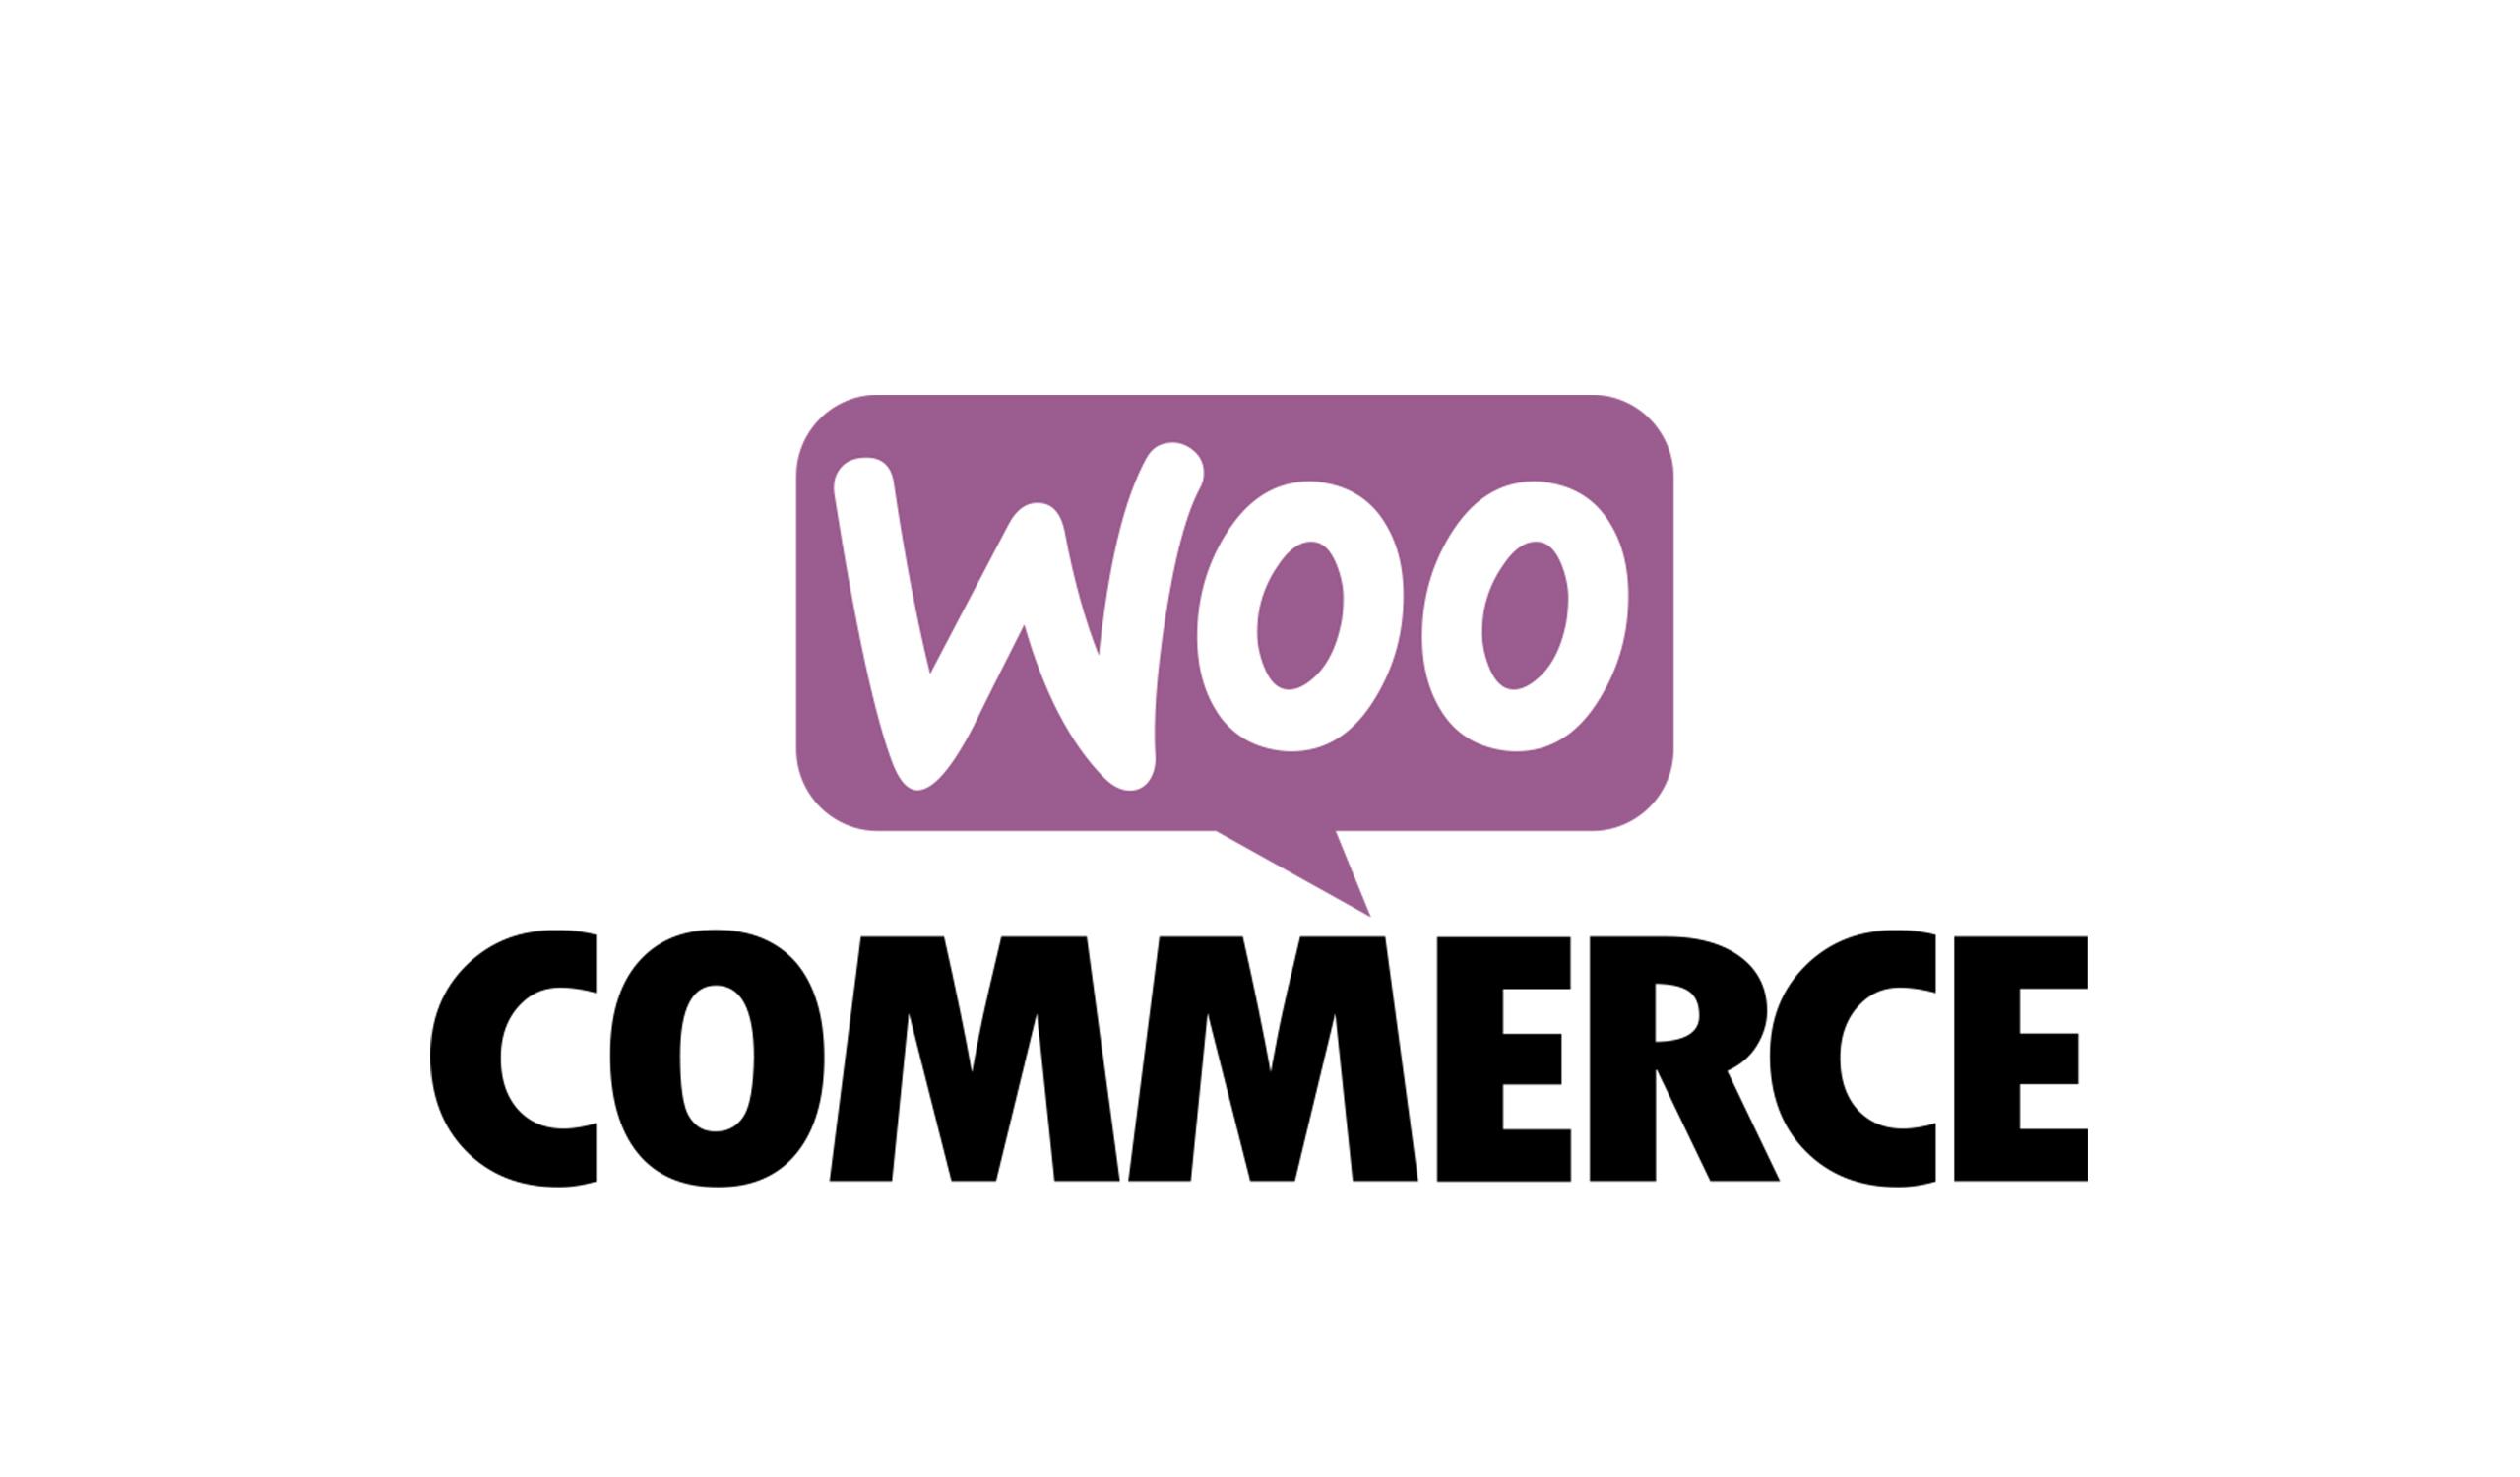 cuckhoo-web-design-digital-marketing-industry-skills-woo-commerce